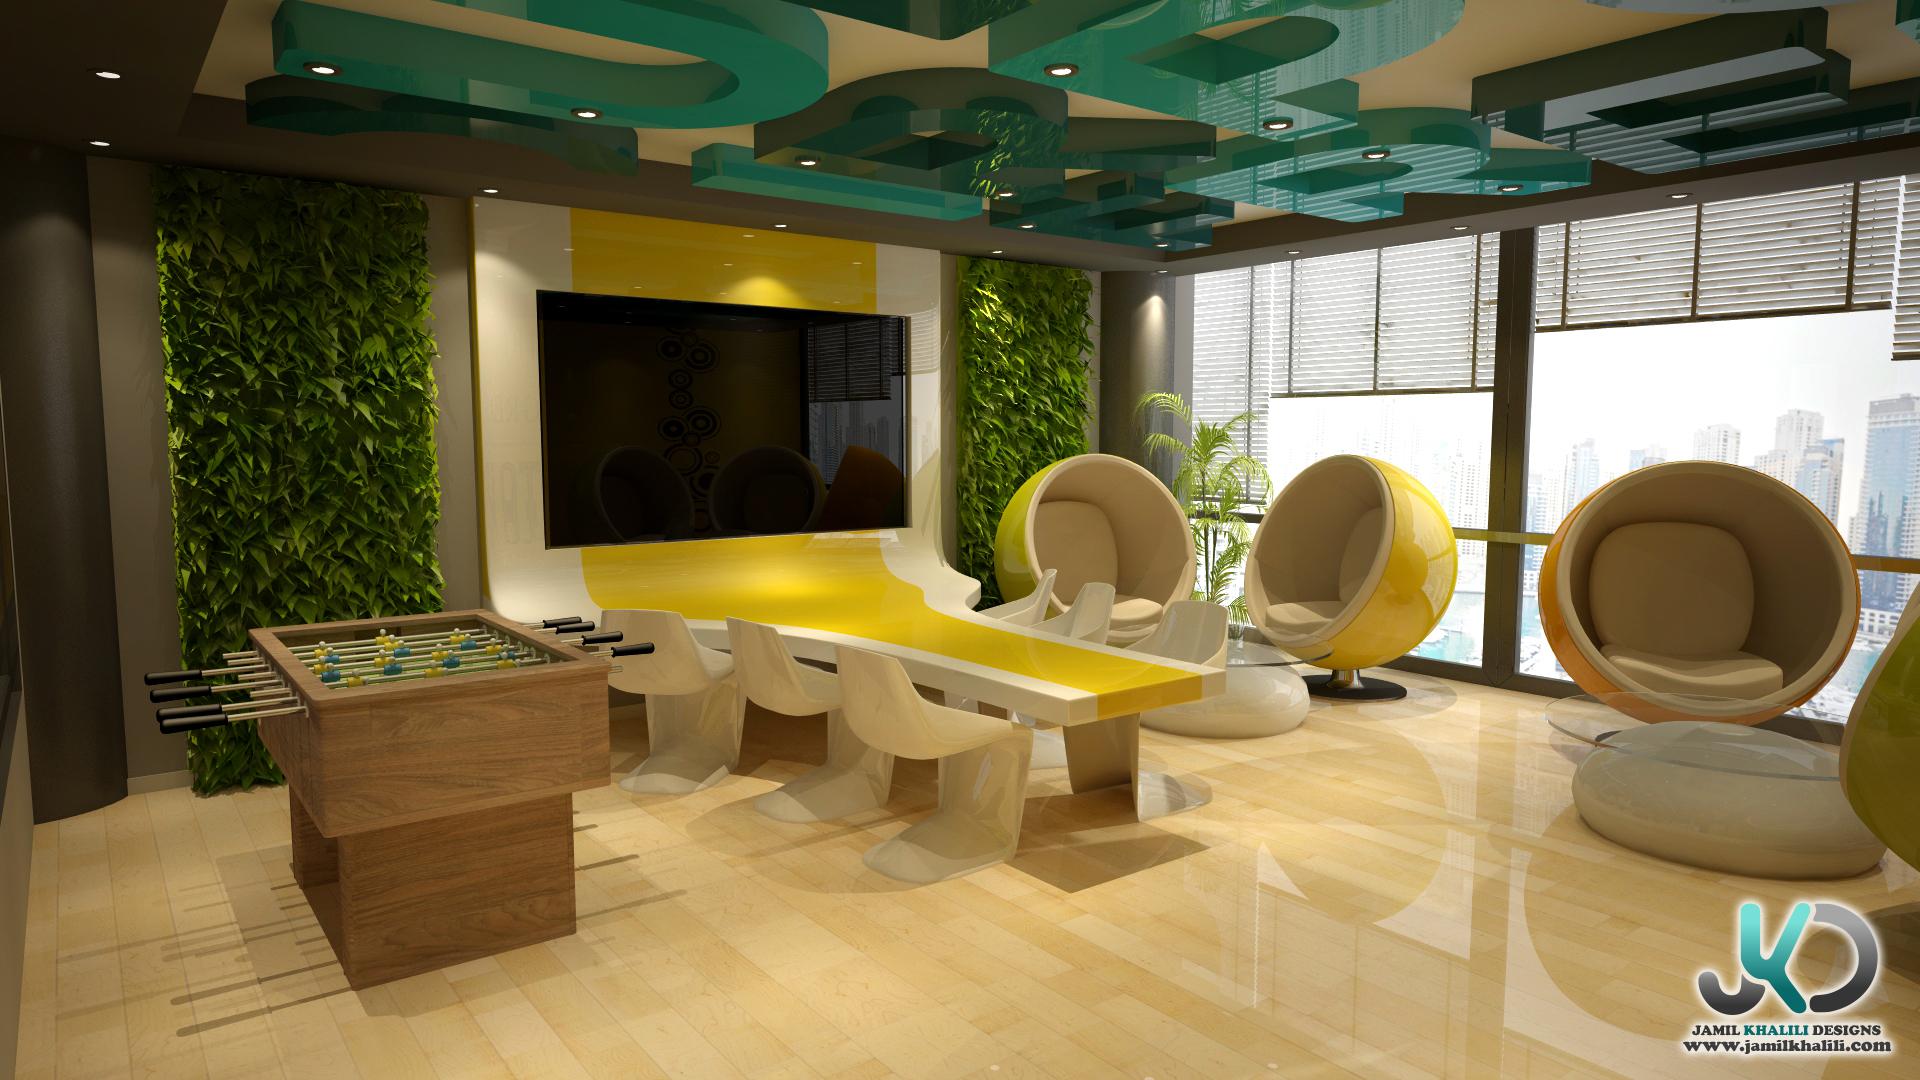 Dafza creative room office concept b dubai uae by for Office design uae